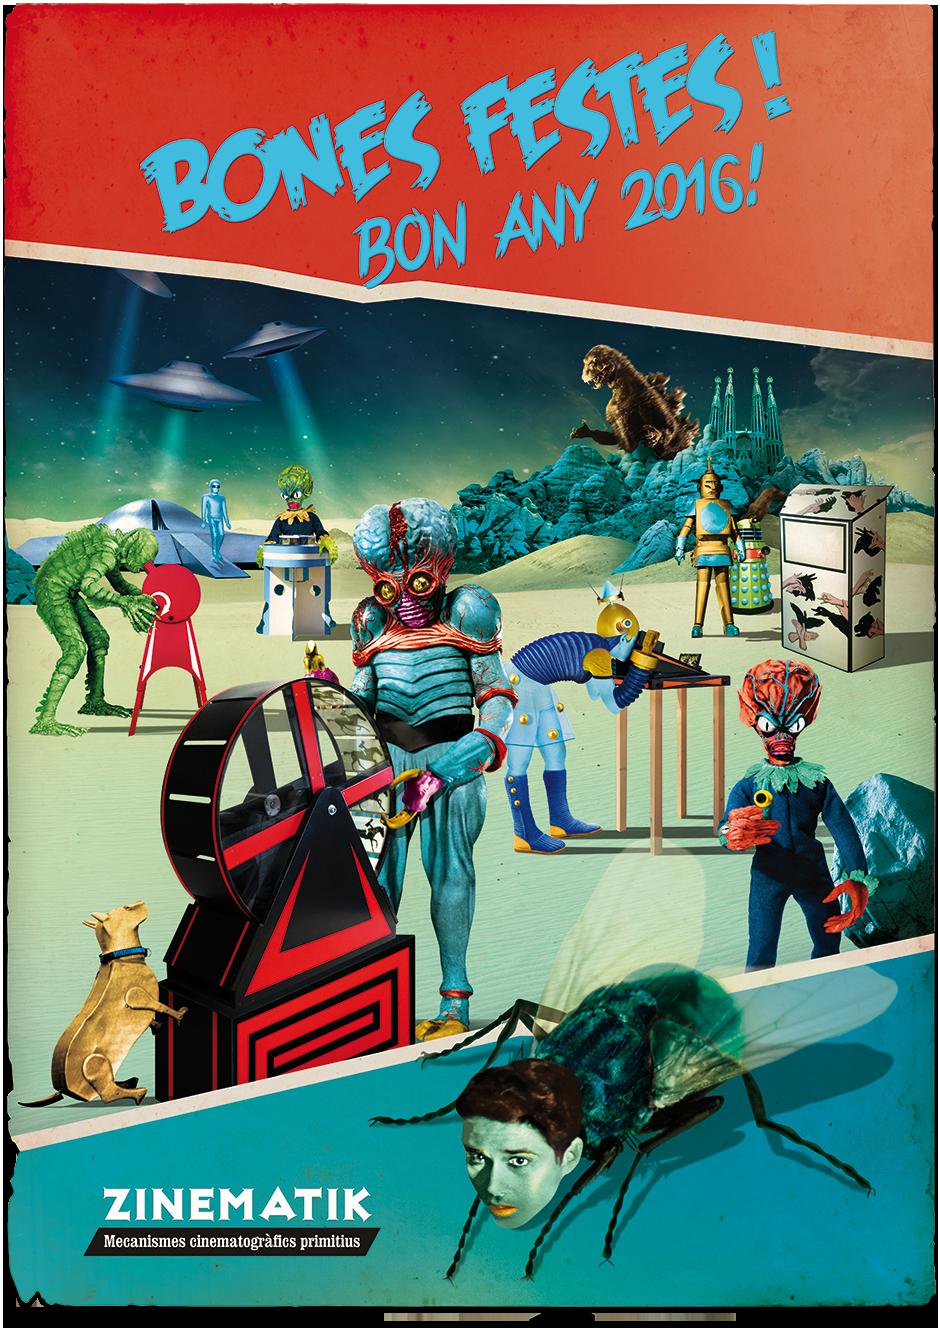 navidad Christmas Series B cine b vintage science fiction Movies cine Monstruos monsters monstres science fiction